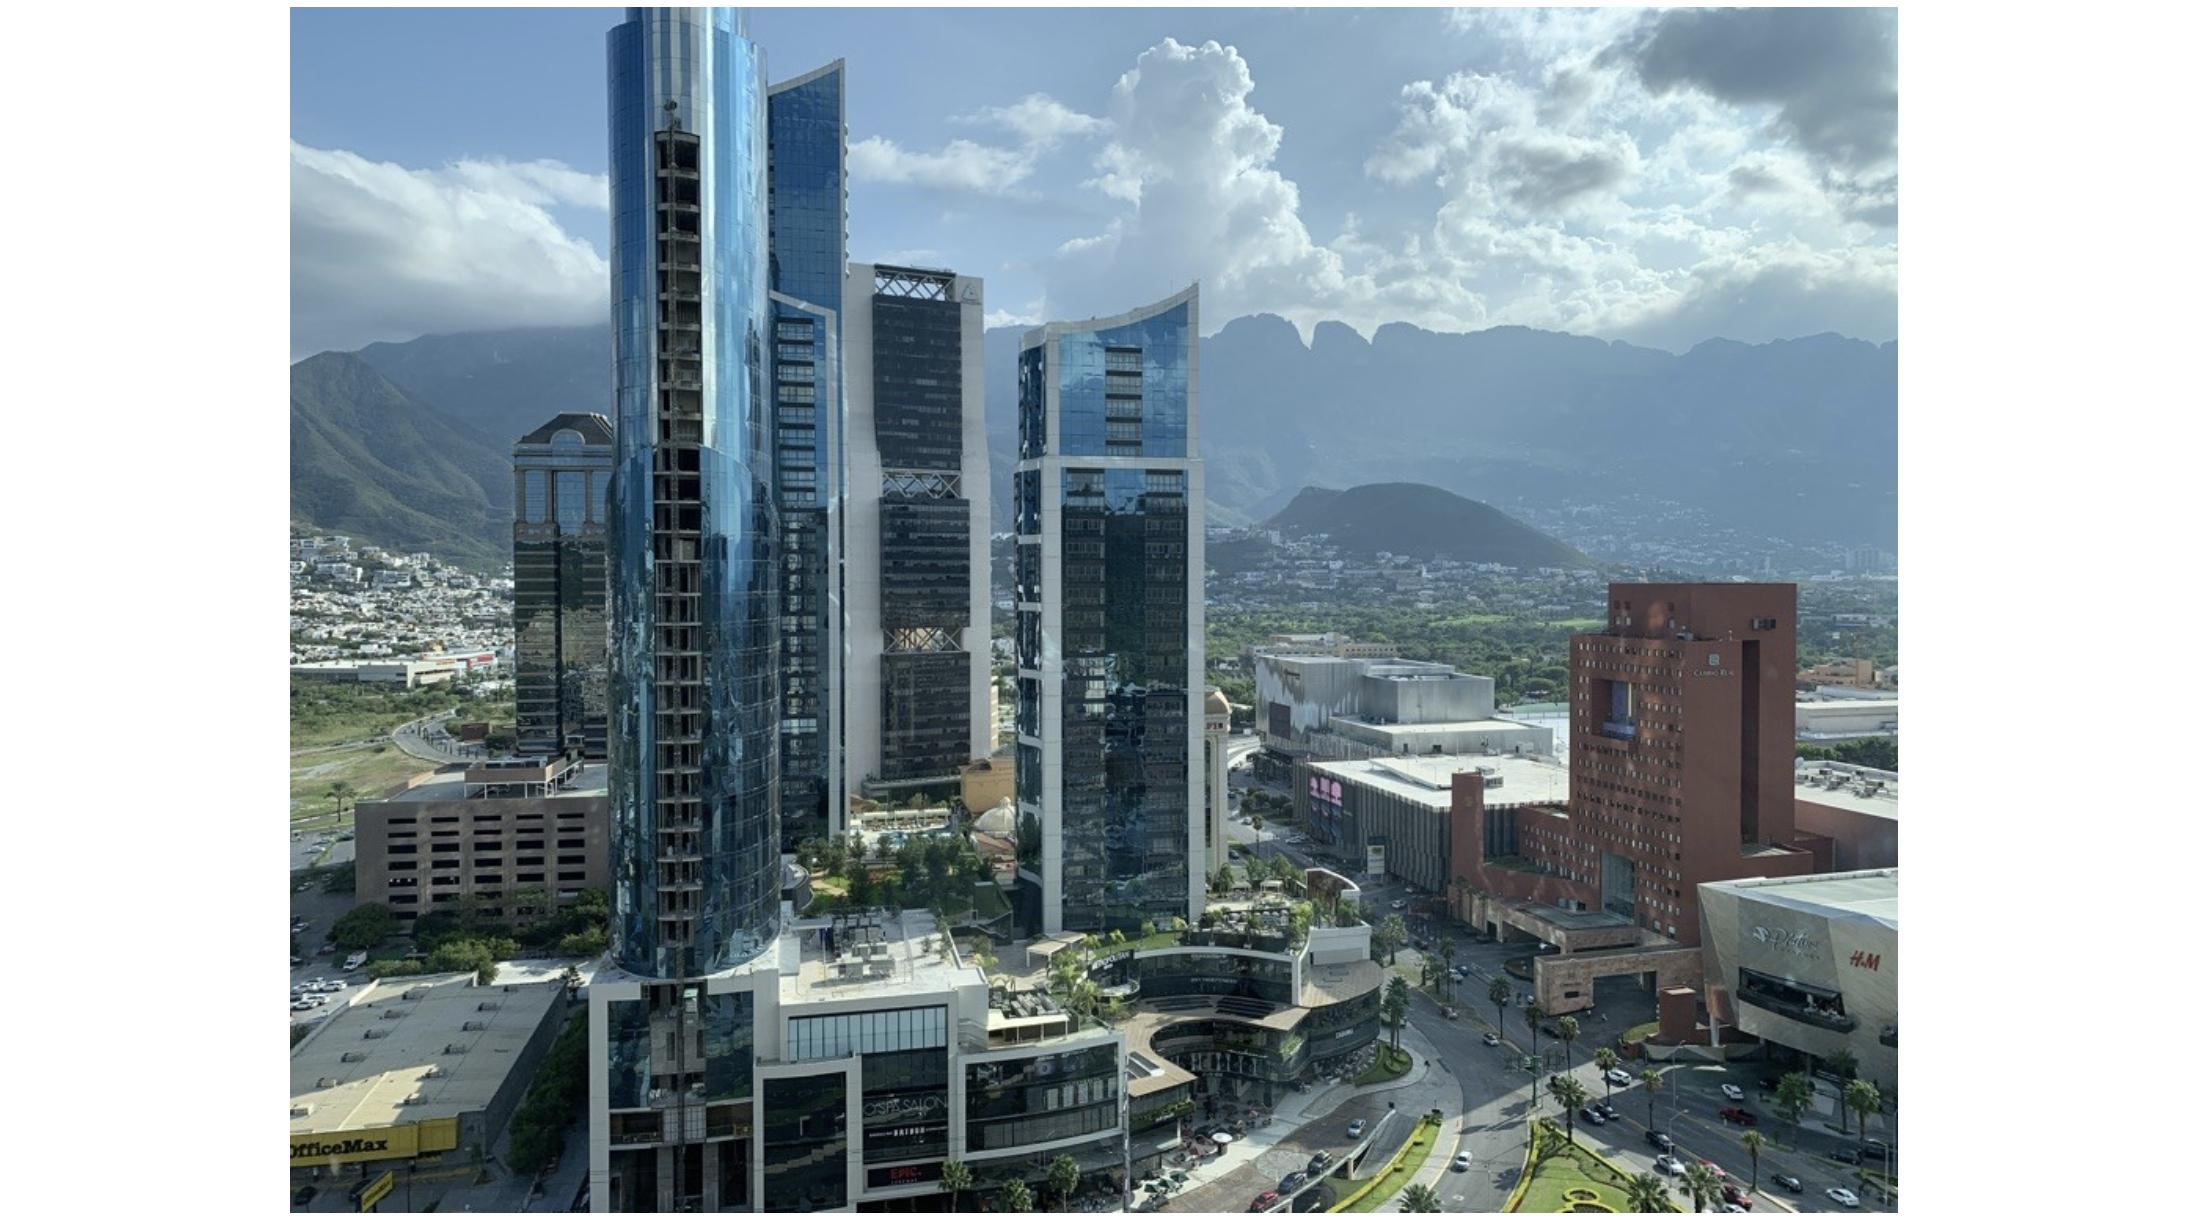 photograph of Monterrey Mexico skyscrapers